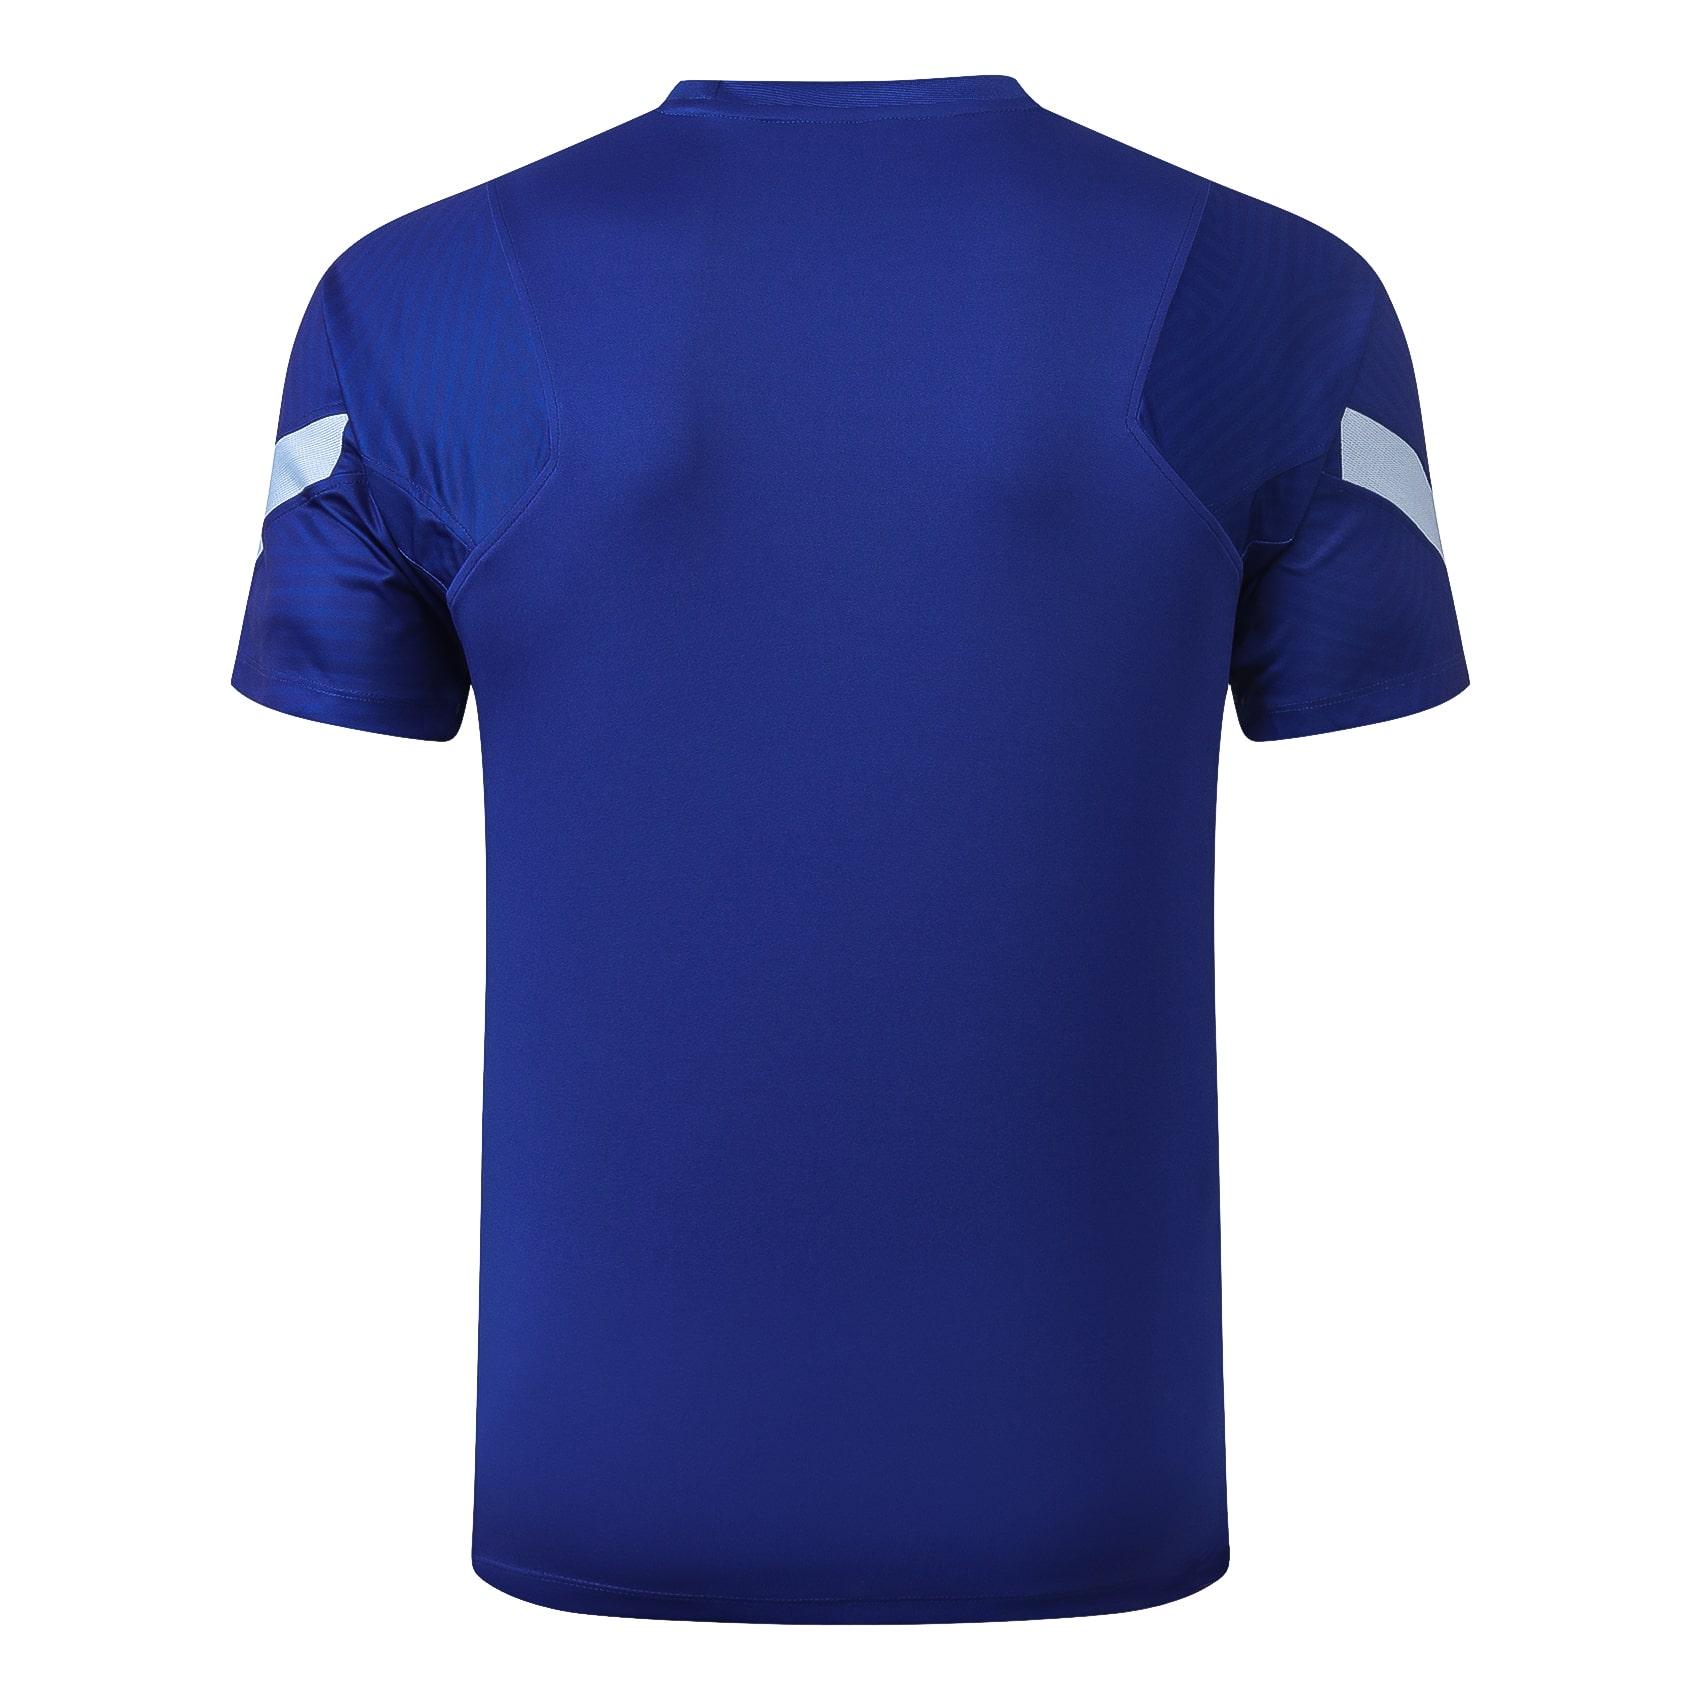 CAMISA DE TREINO CHELSEA FC 2021, UNIFORME DE TREINO